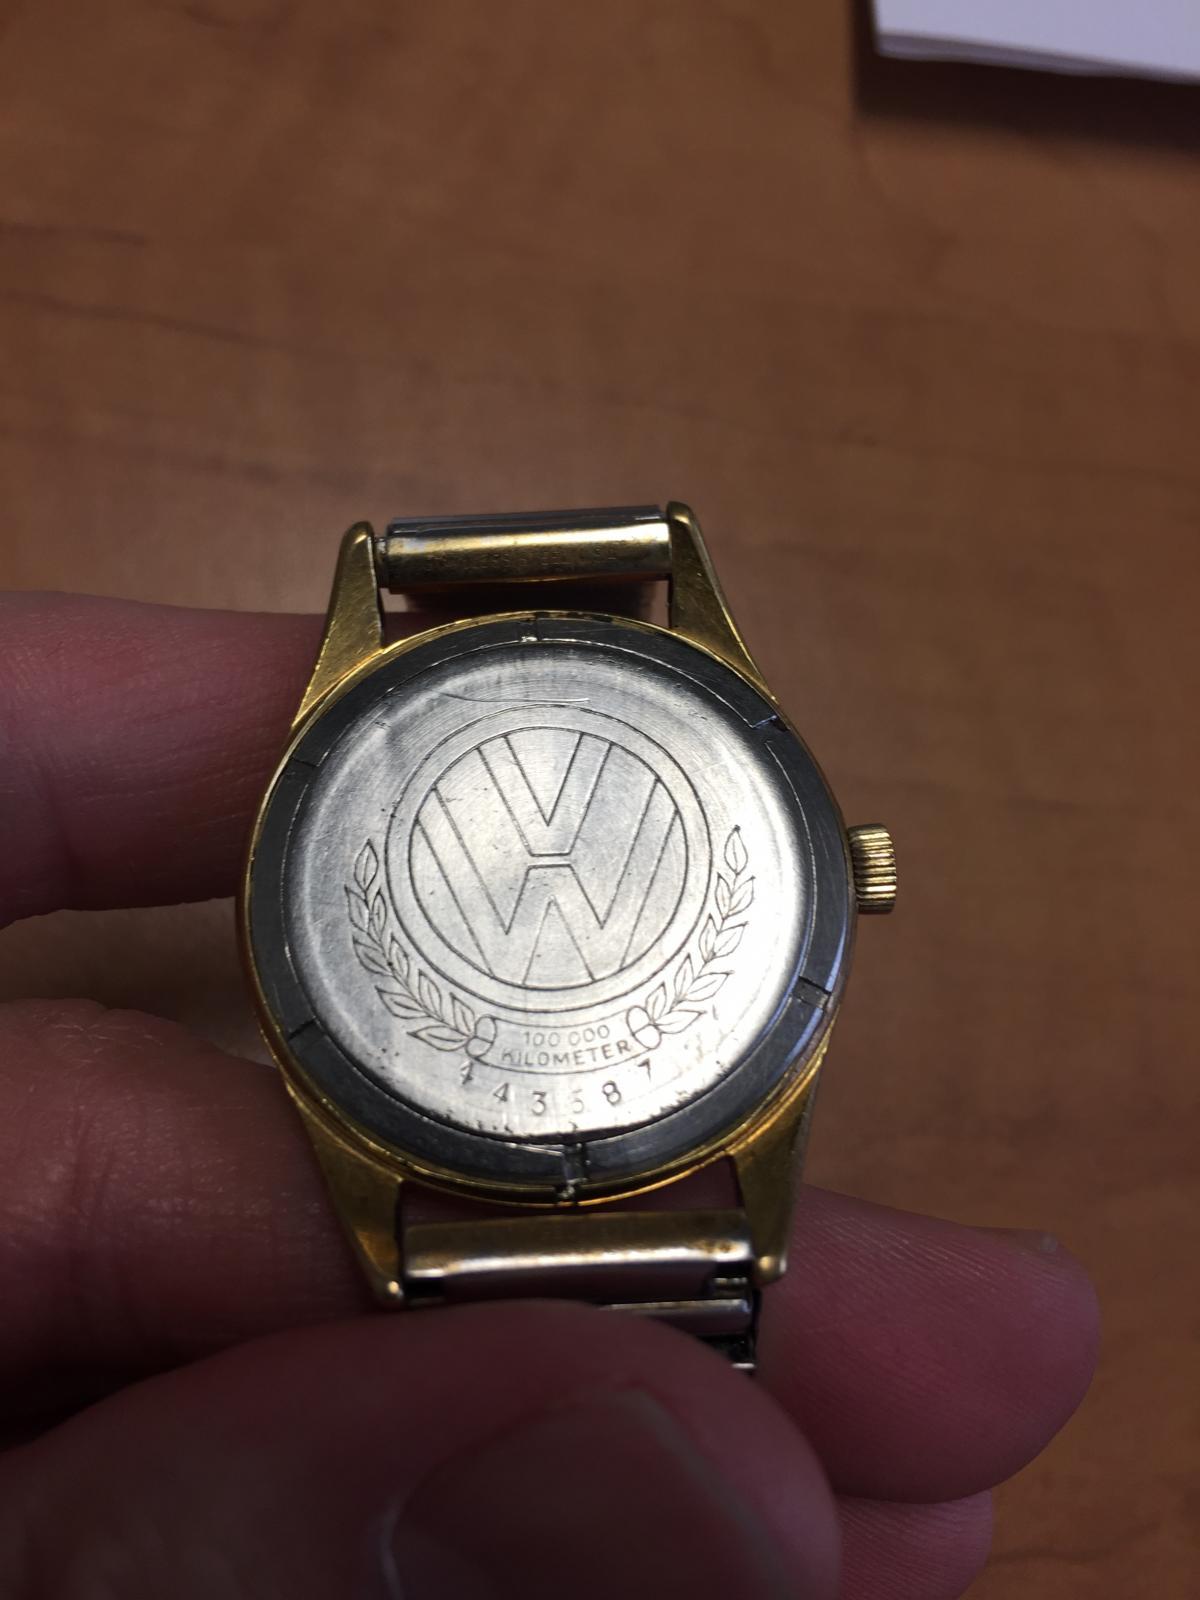 100,000 km watch